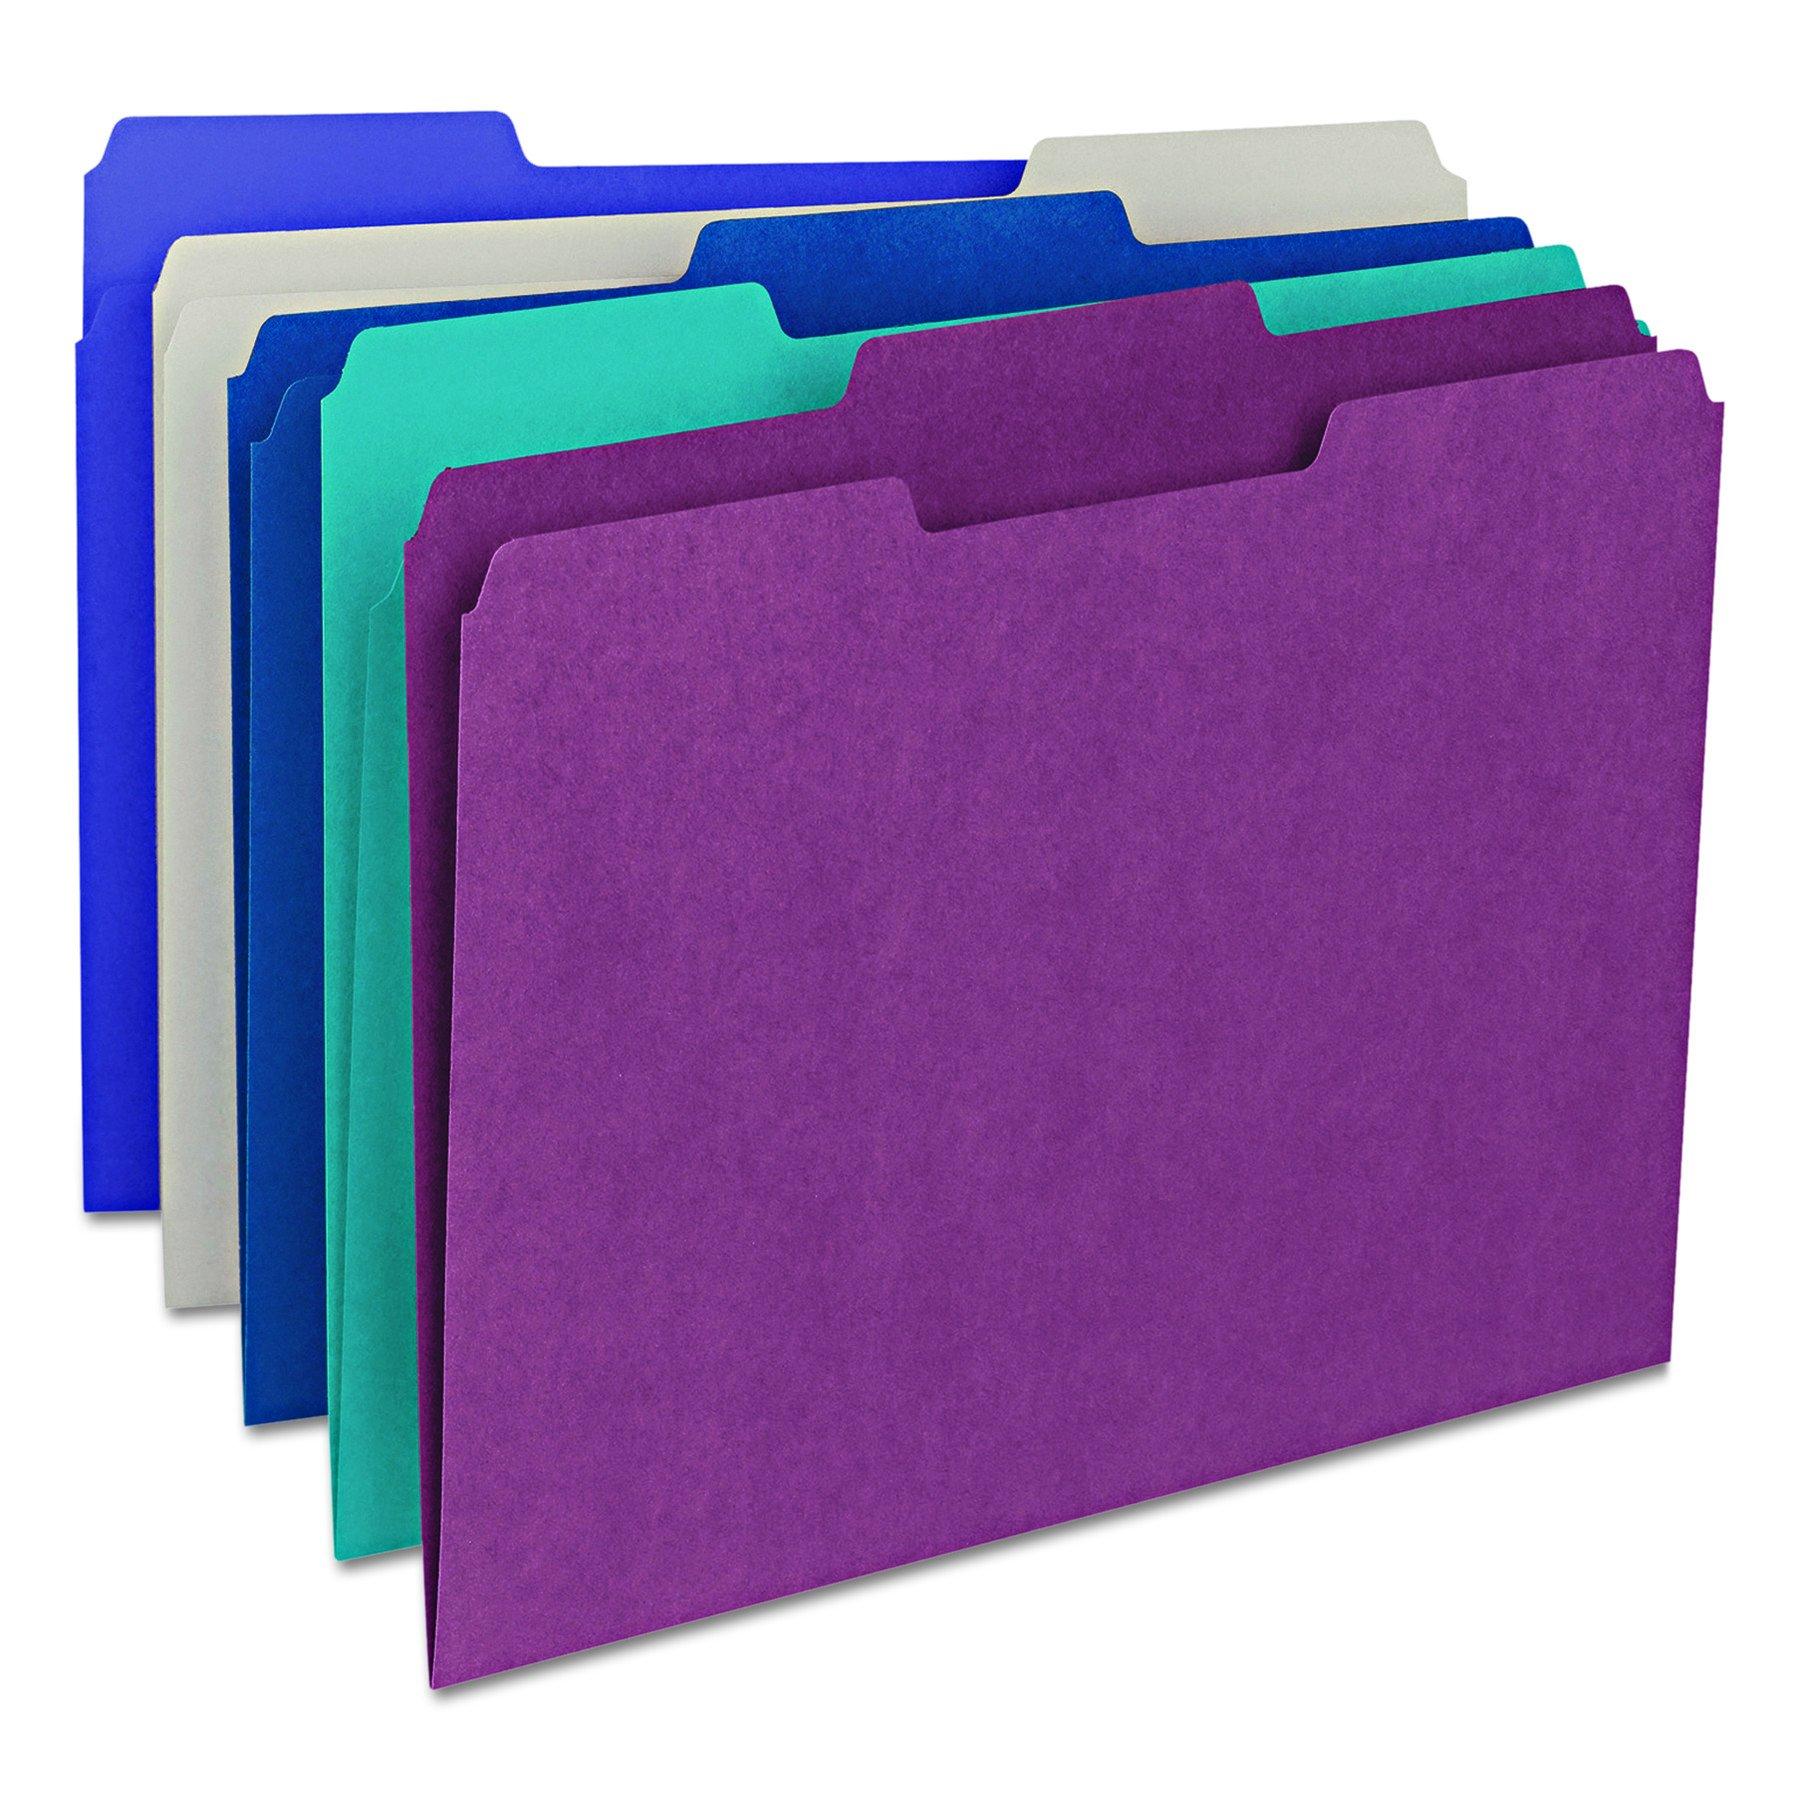 Smead File Folder, 1/3-Cut Tab, Letter Size, Assorted Colors, 100 per Box, (11948)